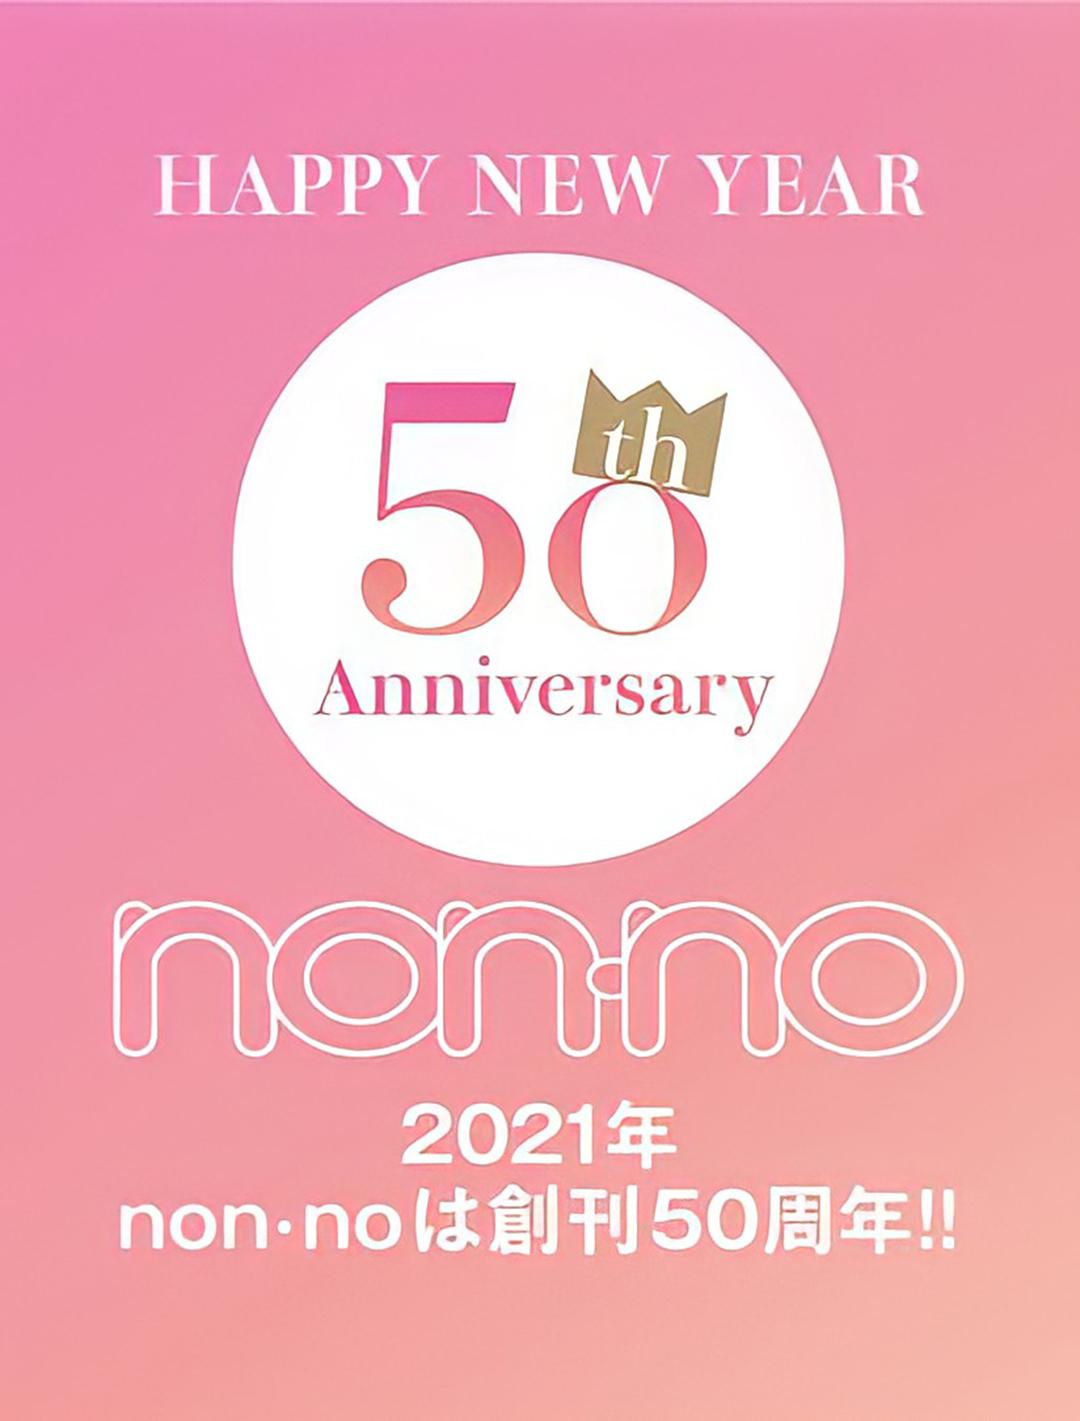 HAPPY NEW YEAR 2021年、non-noは創刊50周年!!